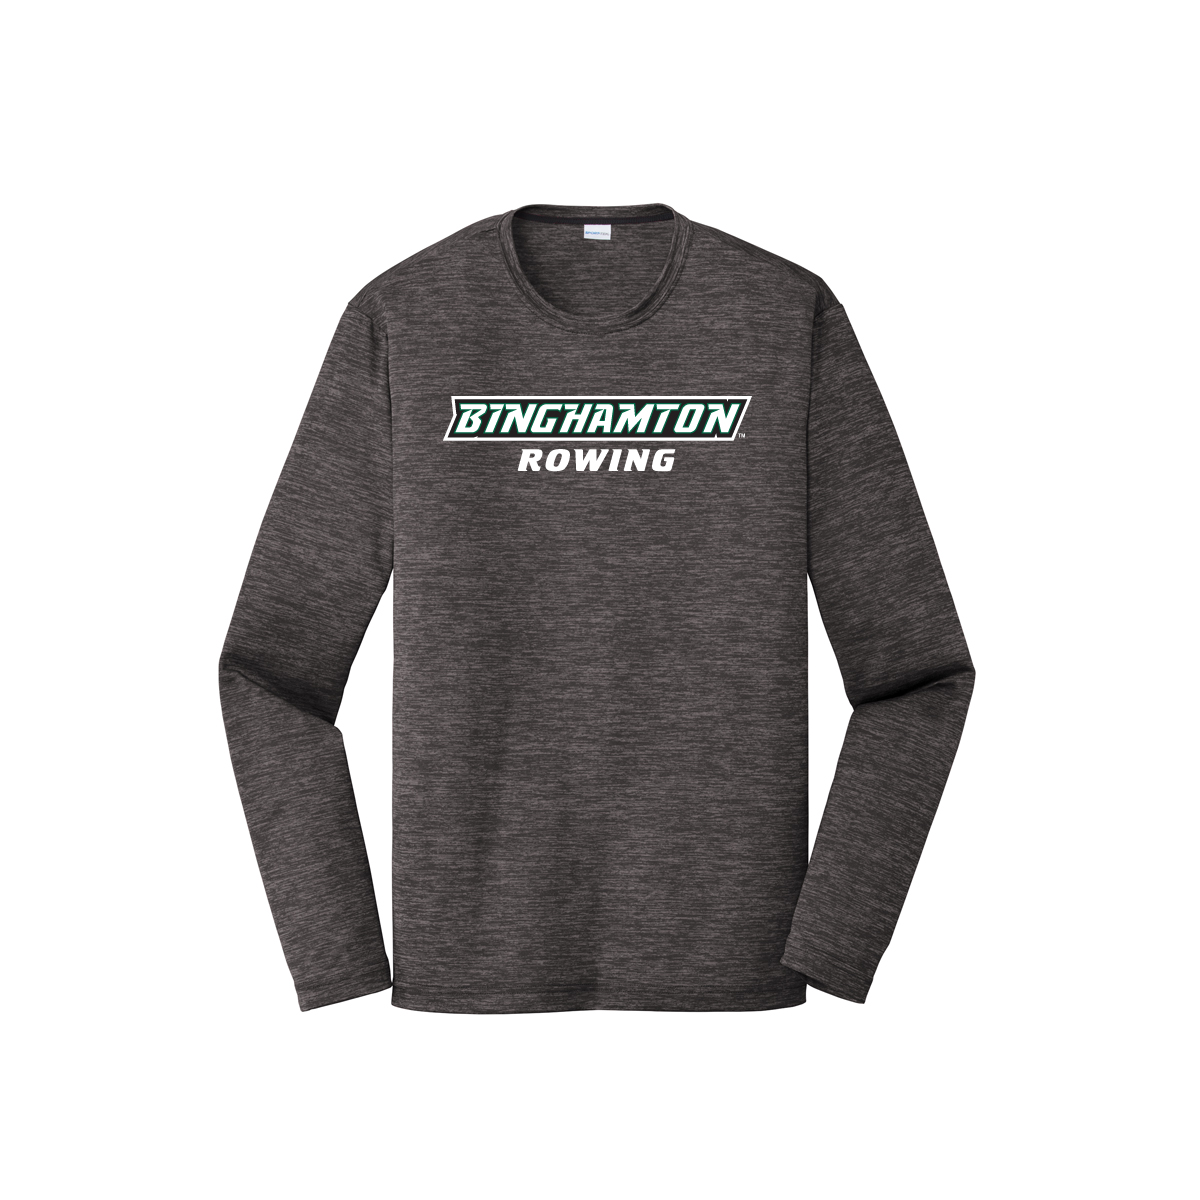 Binghamton Rowing Long Sleeve Performance T Shirt Embroidery